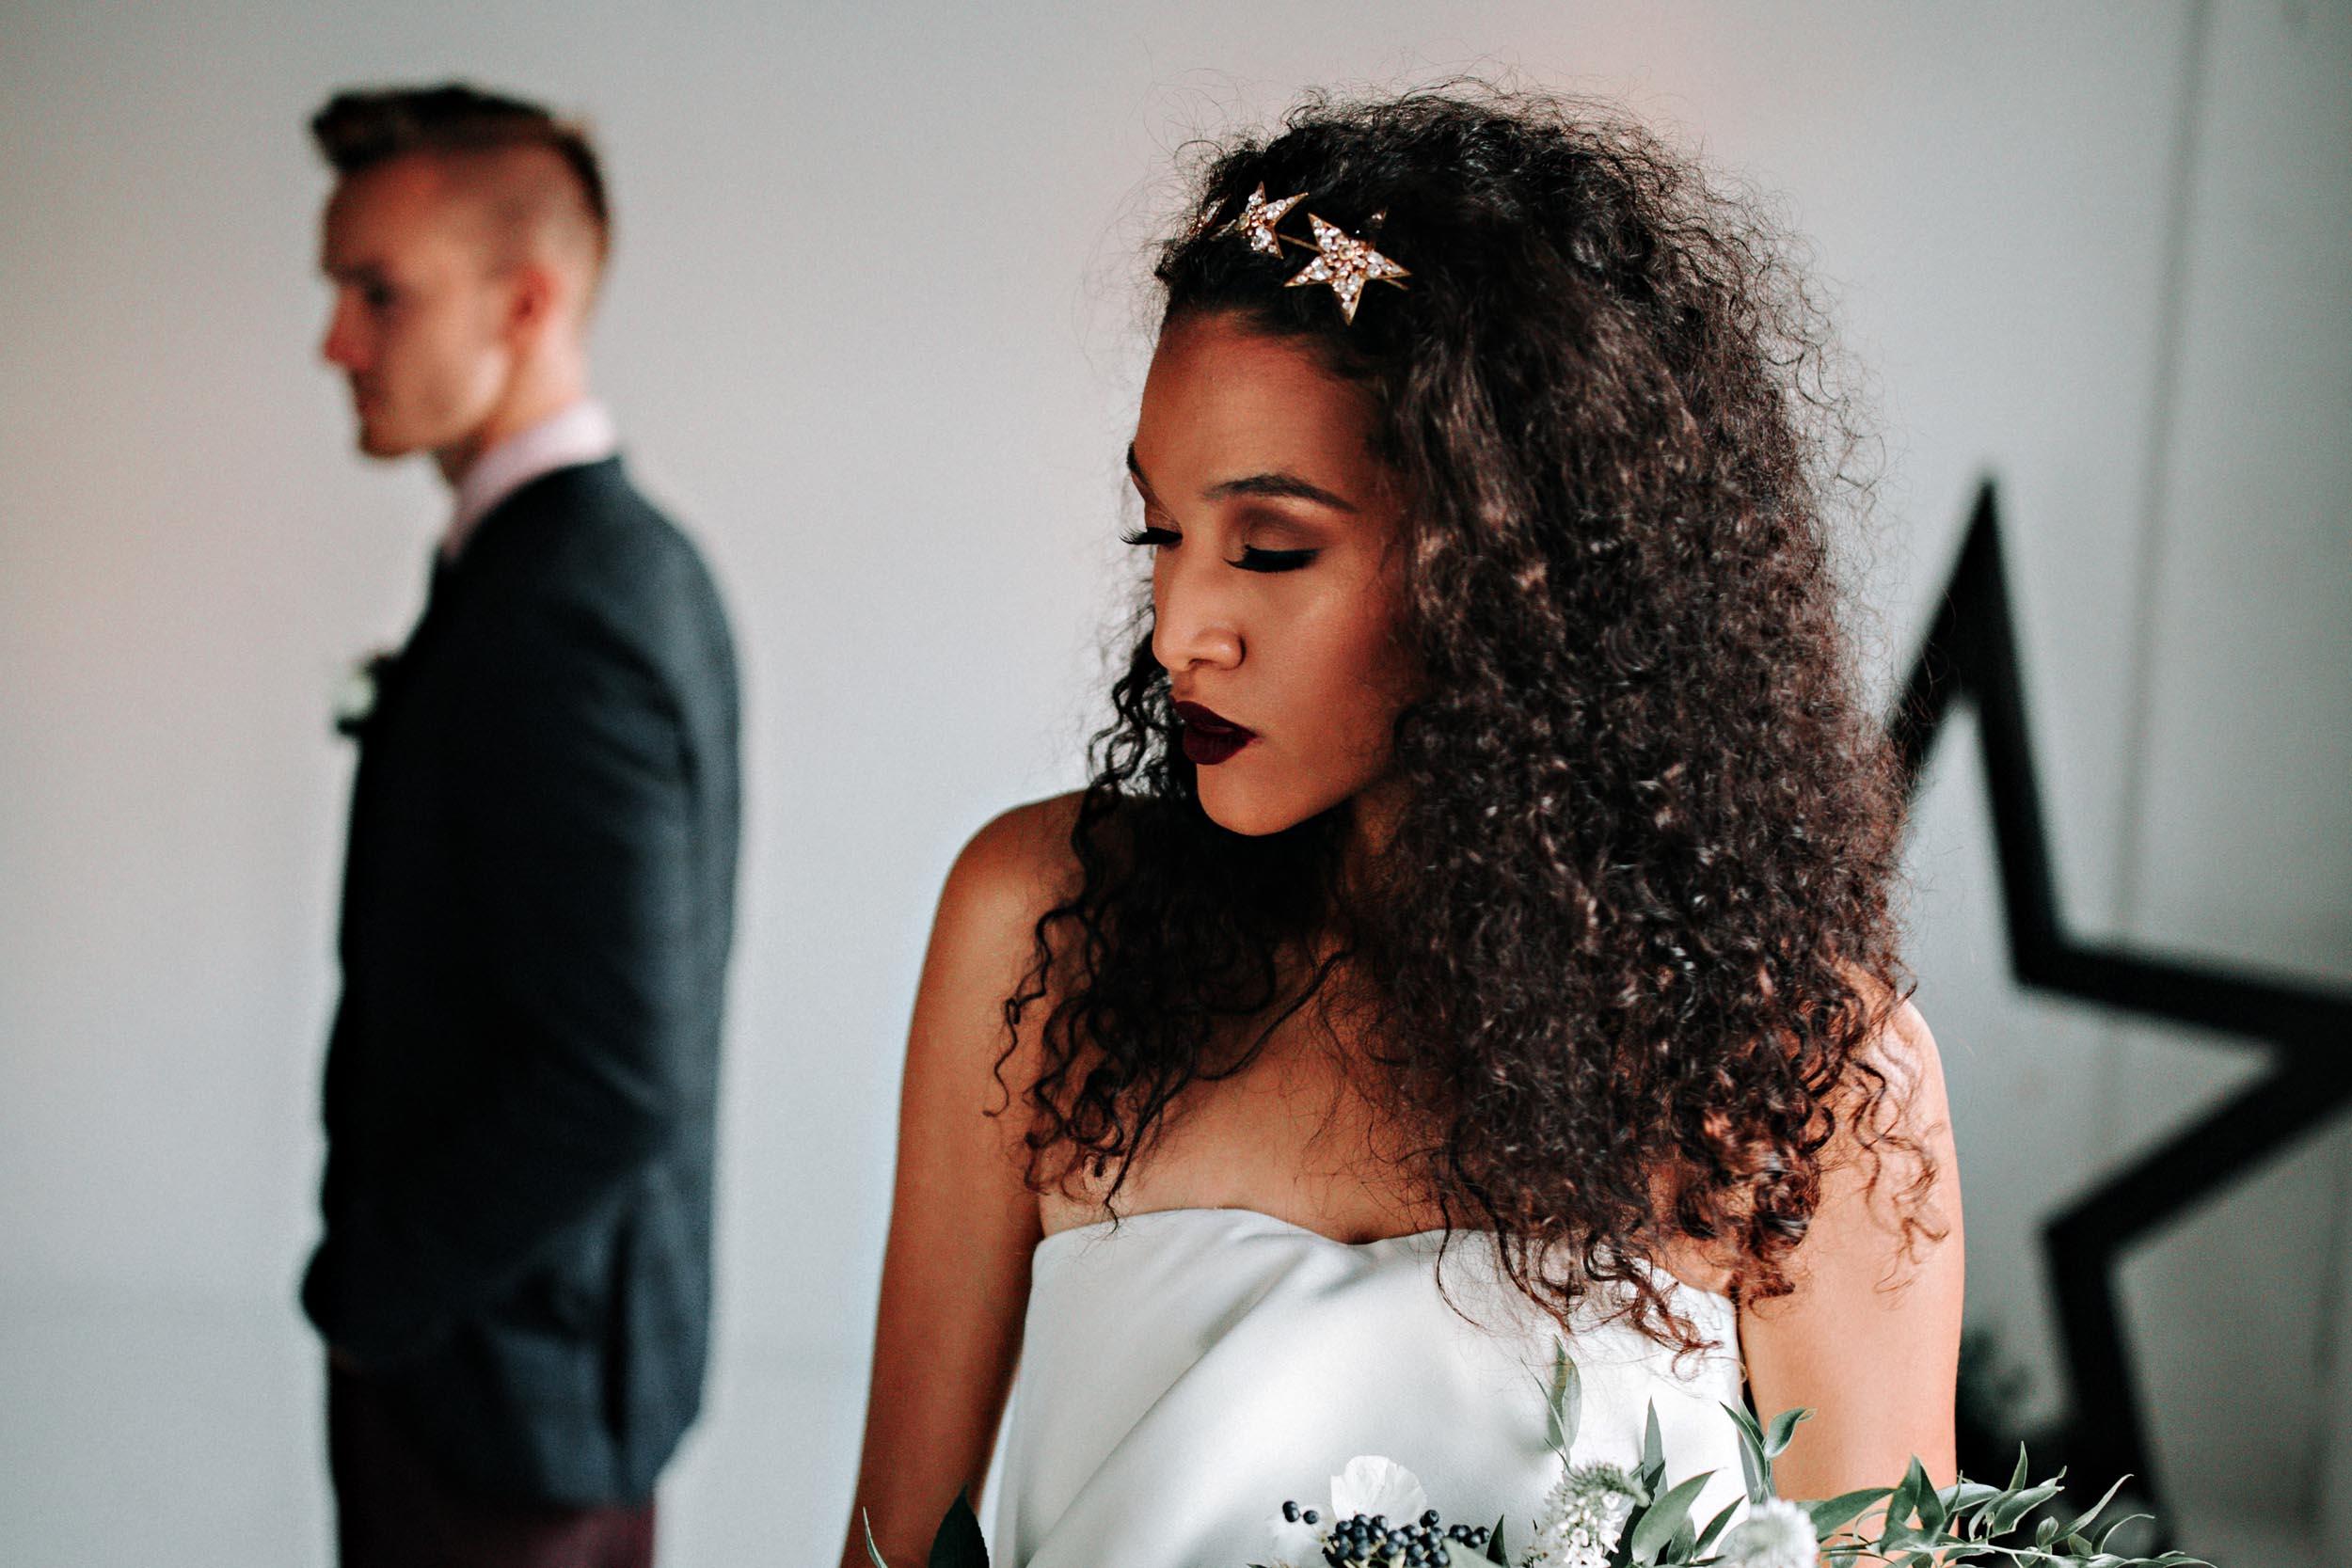 weddings-starsstripes-03.jpg